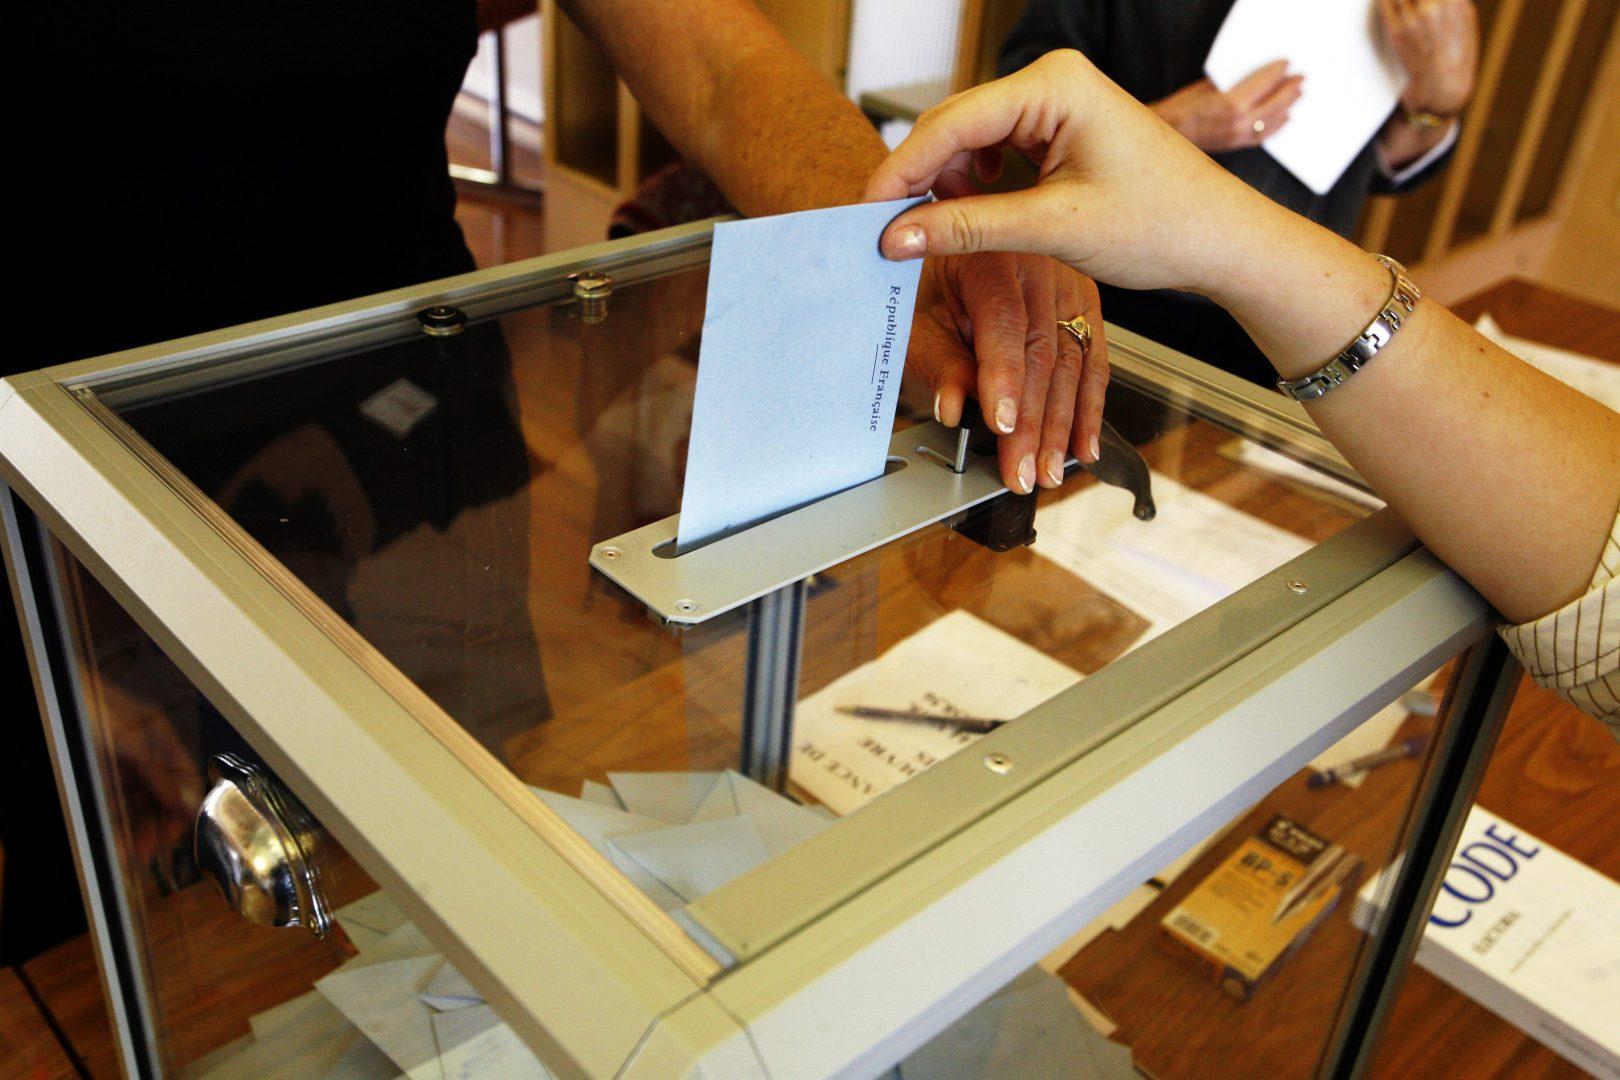 Election_MG_3455.jpg